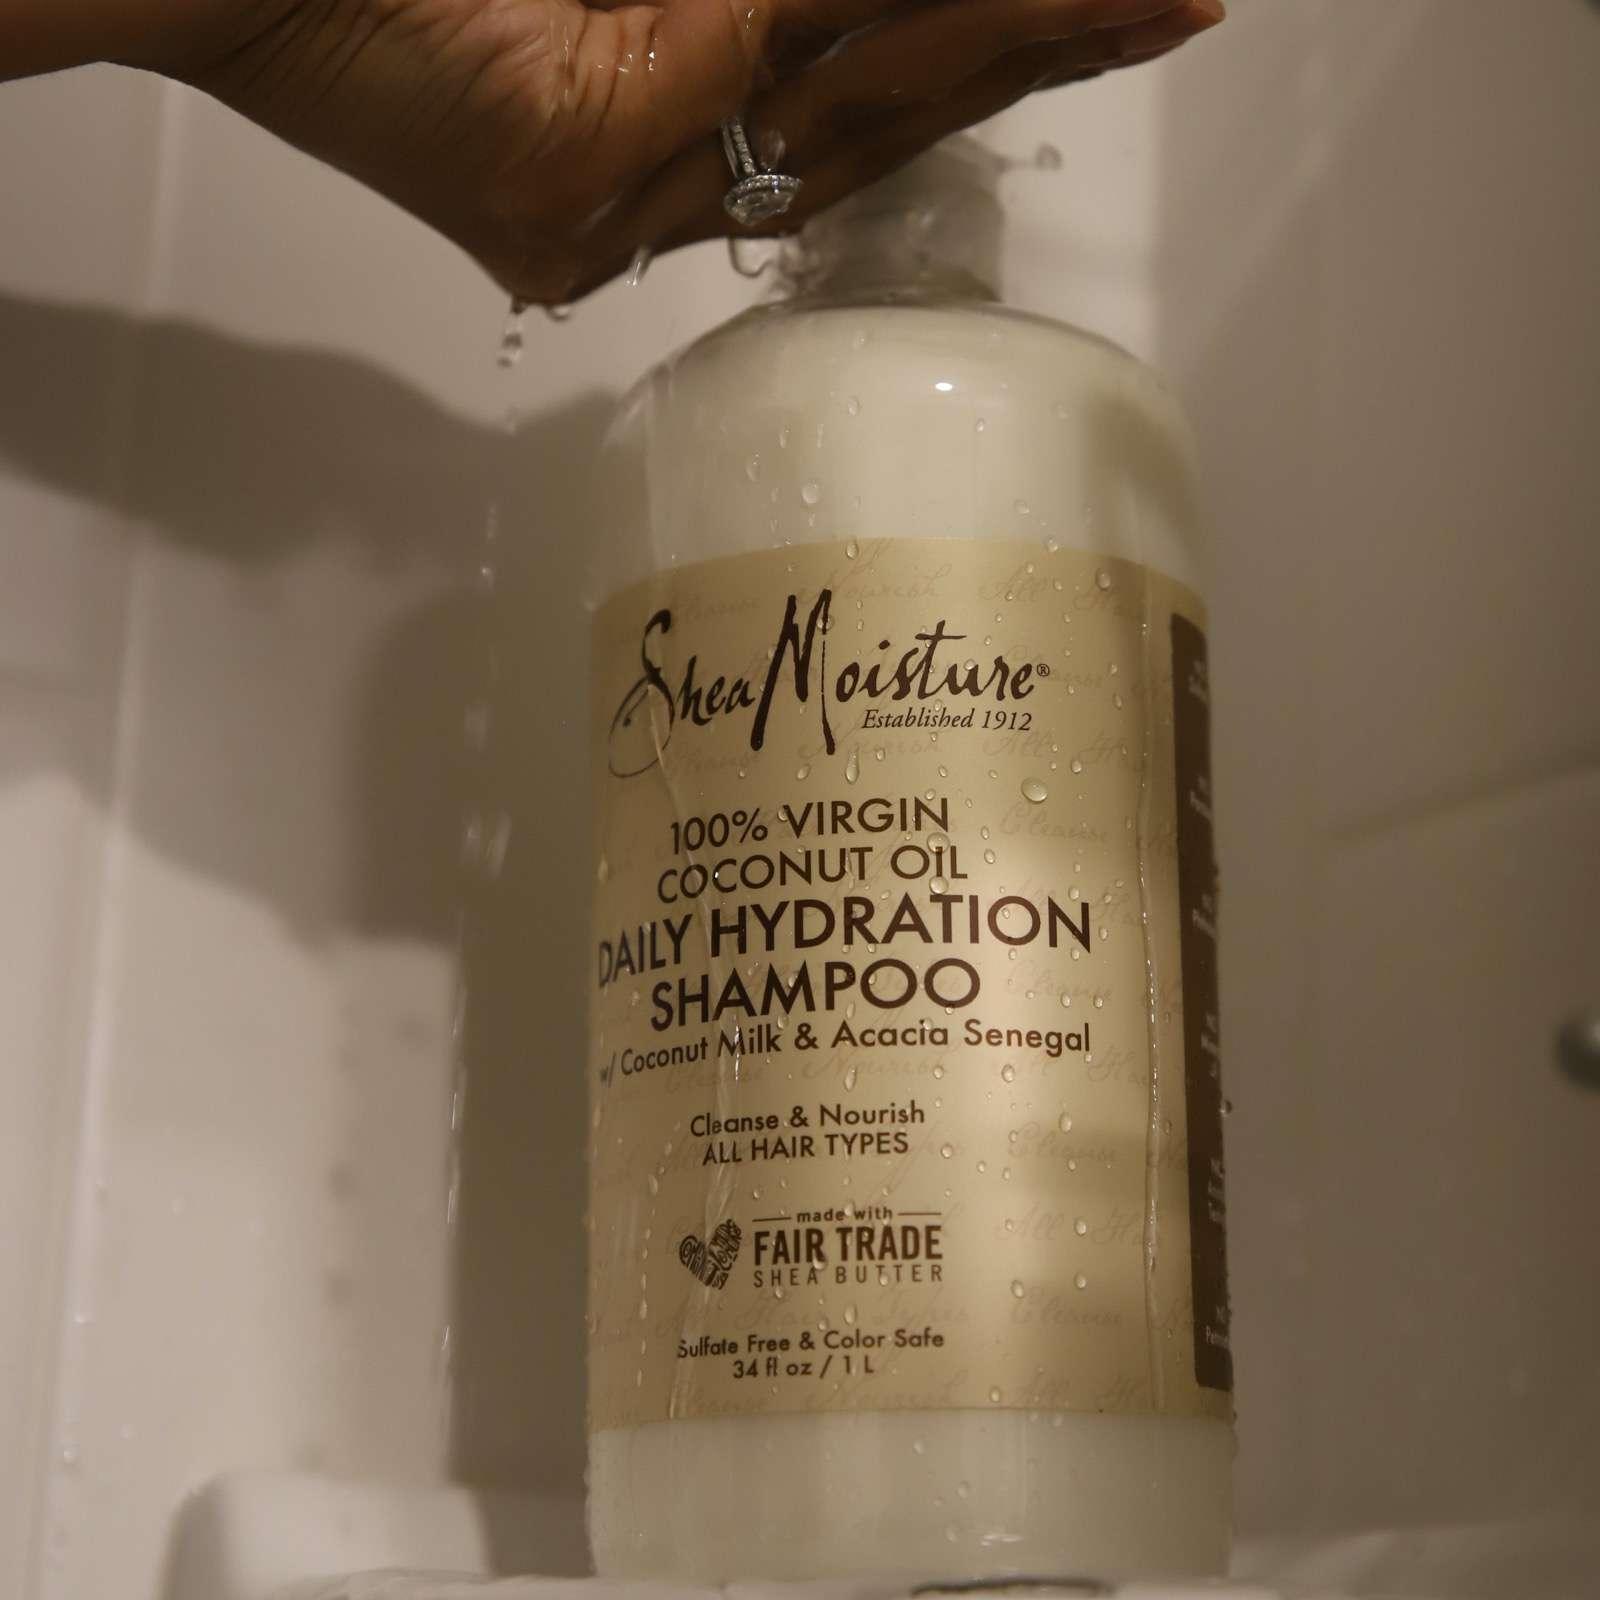 Shea Moisture 100% Virgin Coconut Oil Hydration Shampoo